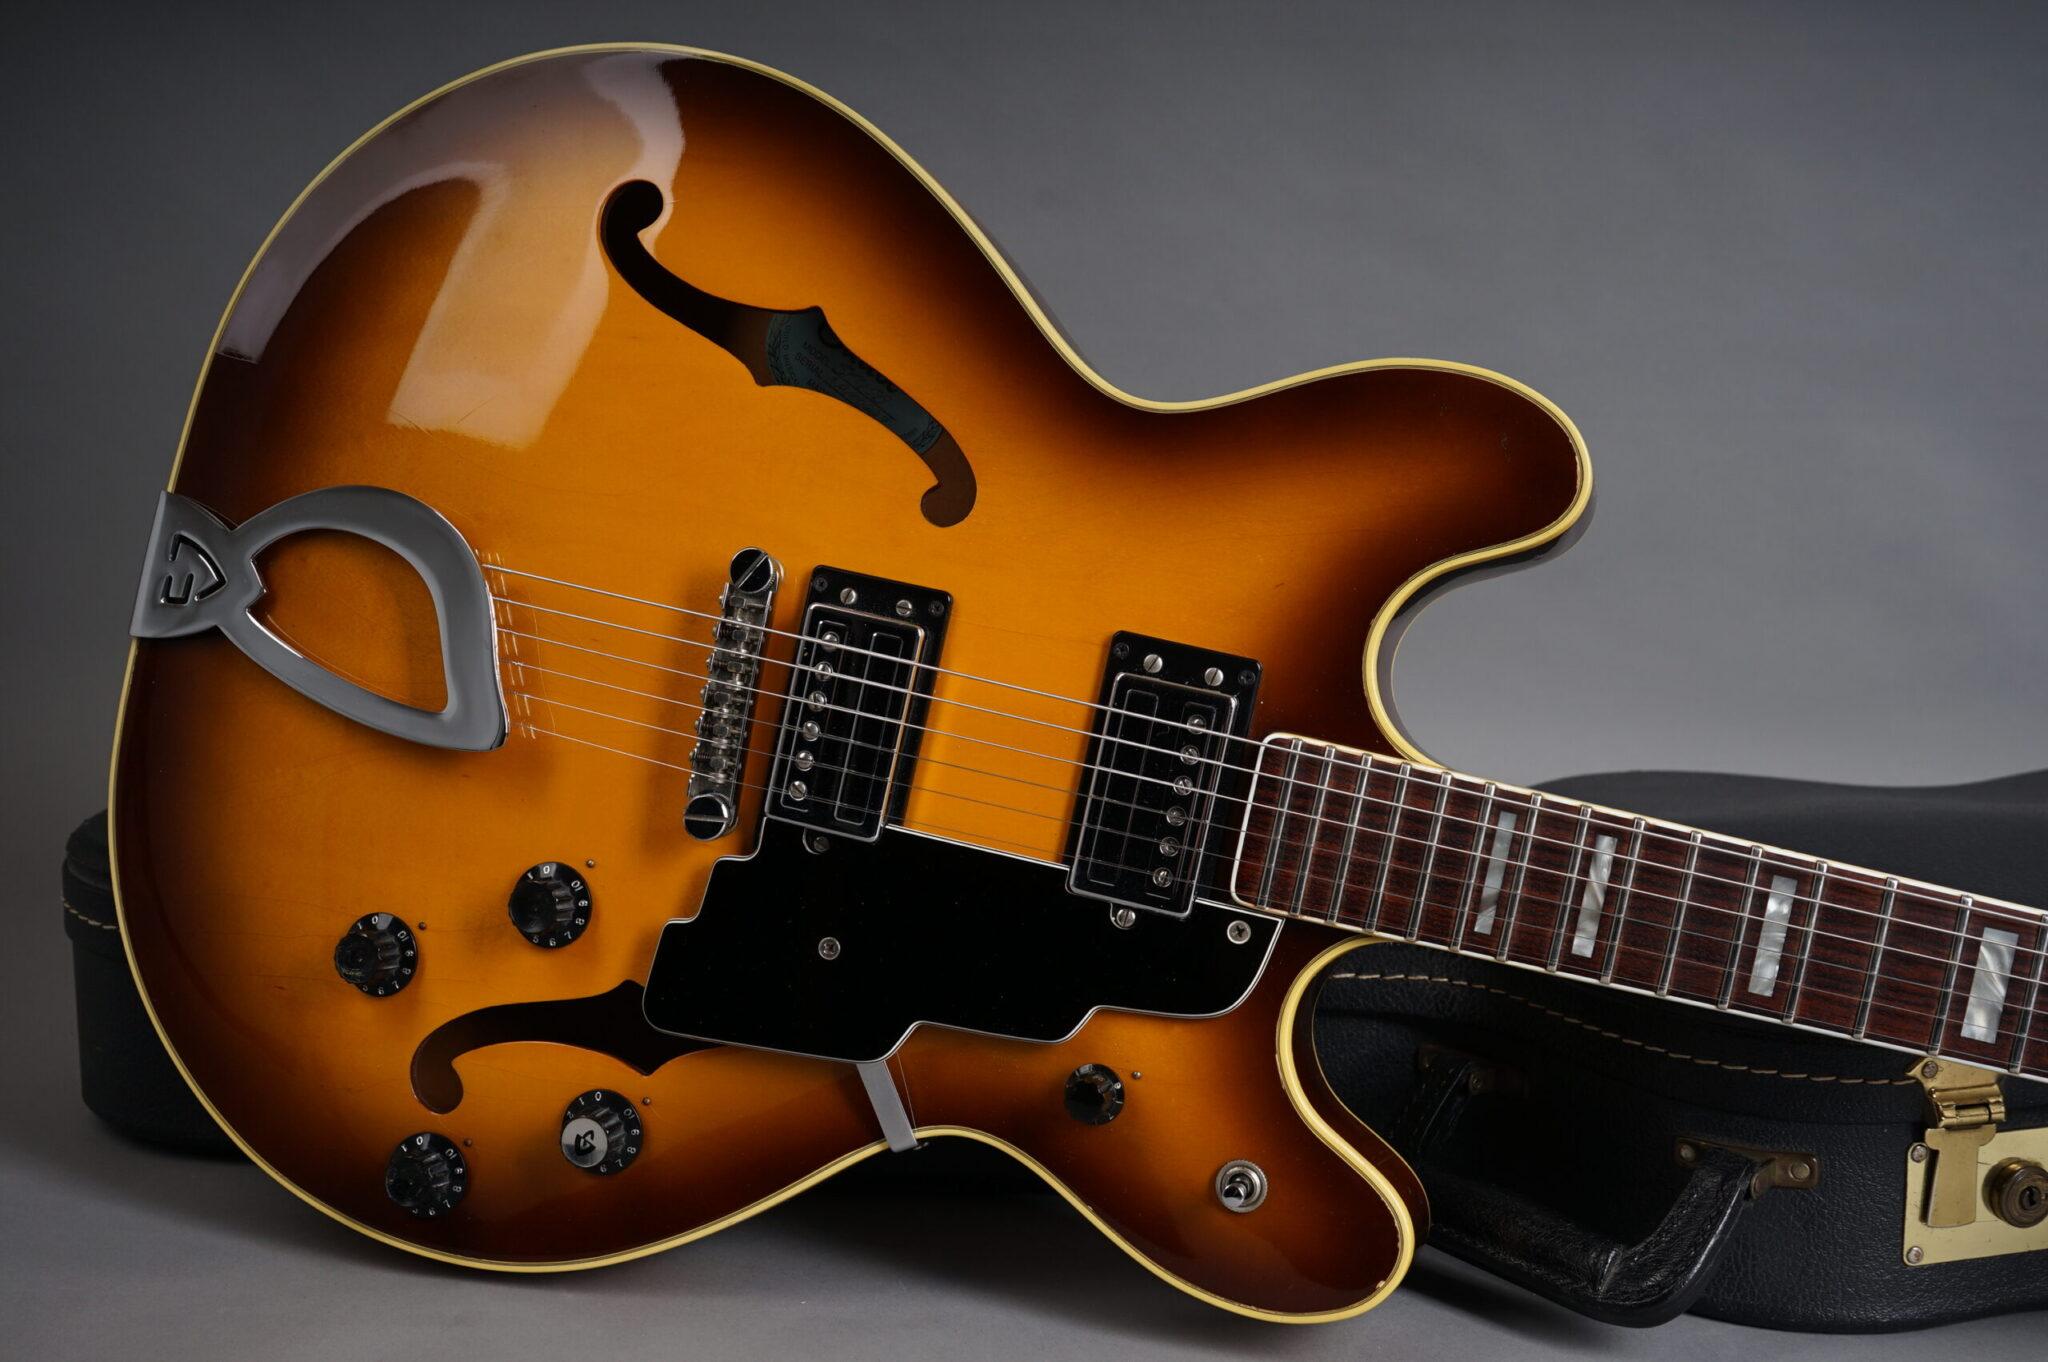 https://guitarpoint.de/app/uploads/products/1980-guild-starfire-iv-sunburst/1980-Guild-StarfireIV-Sunburst-GA100224-8-scaled-2048x1362.jpg